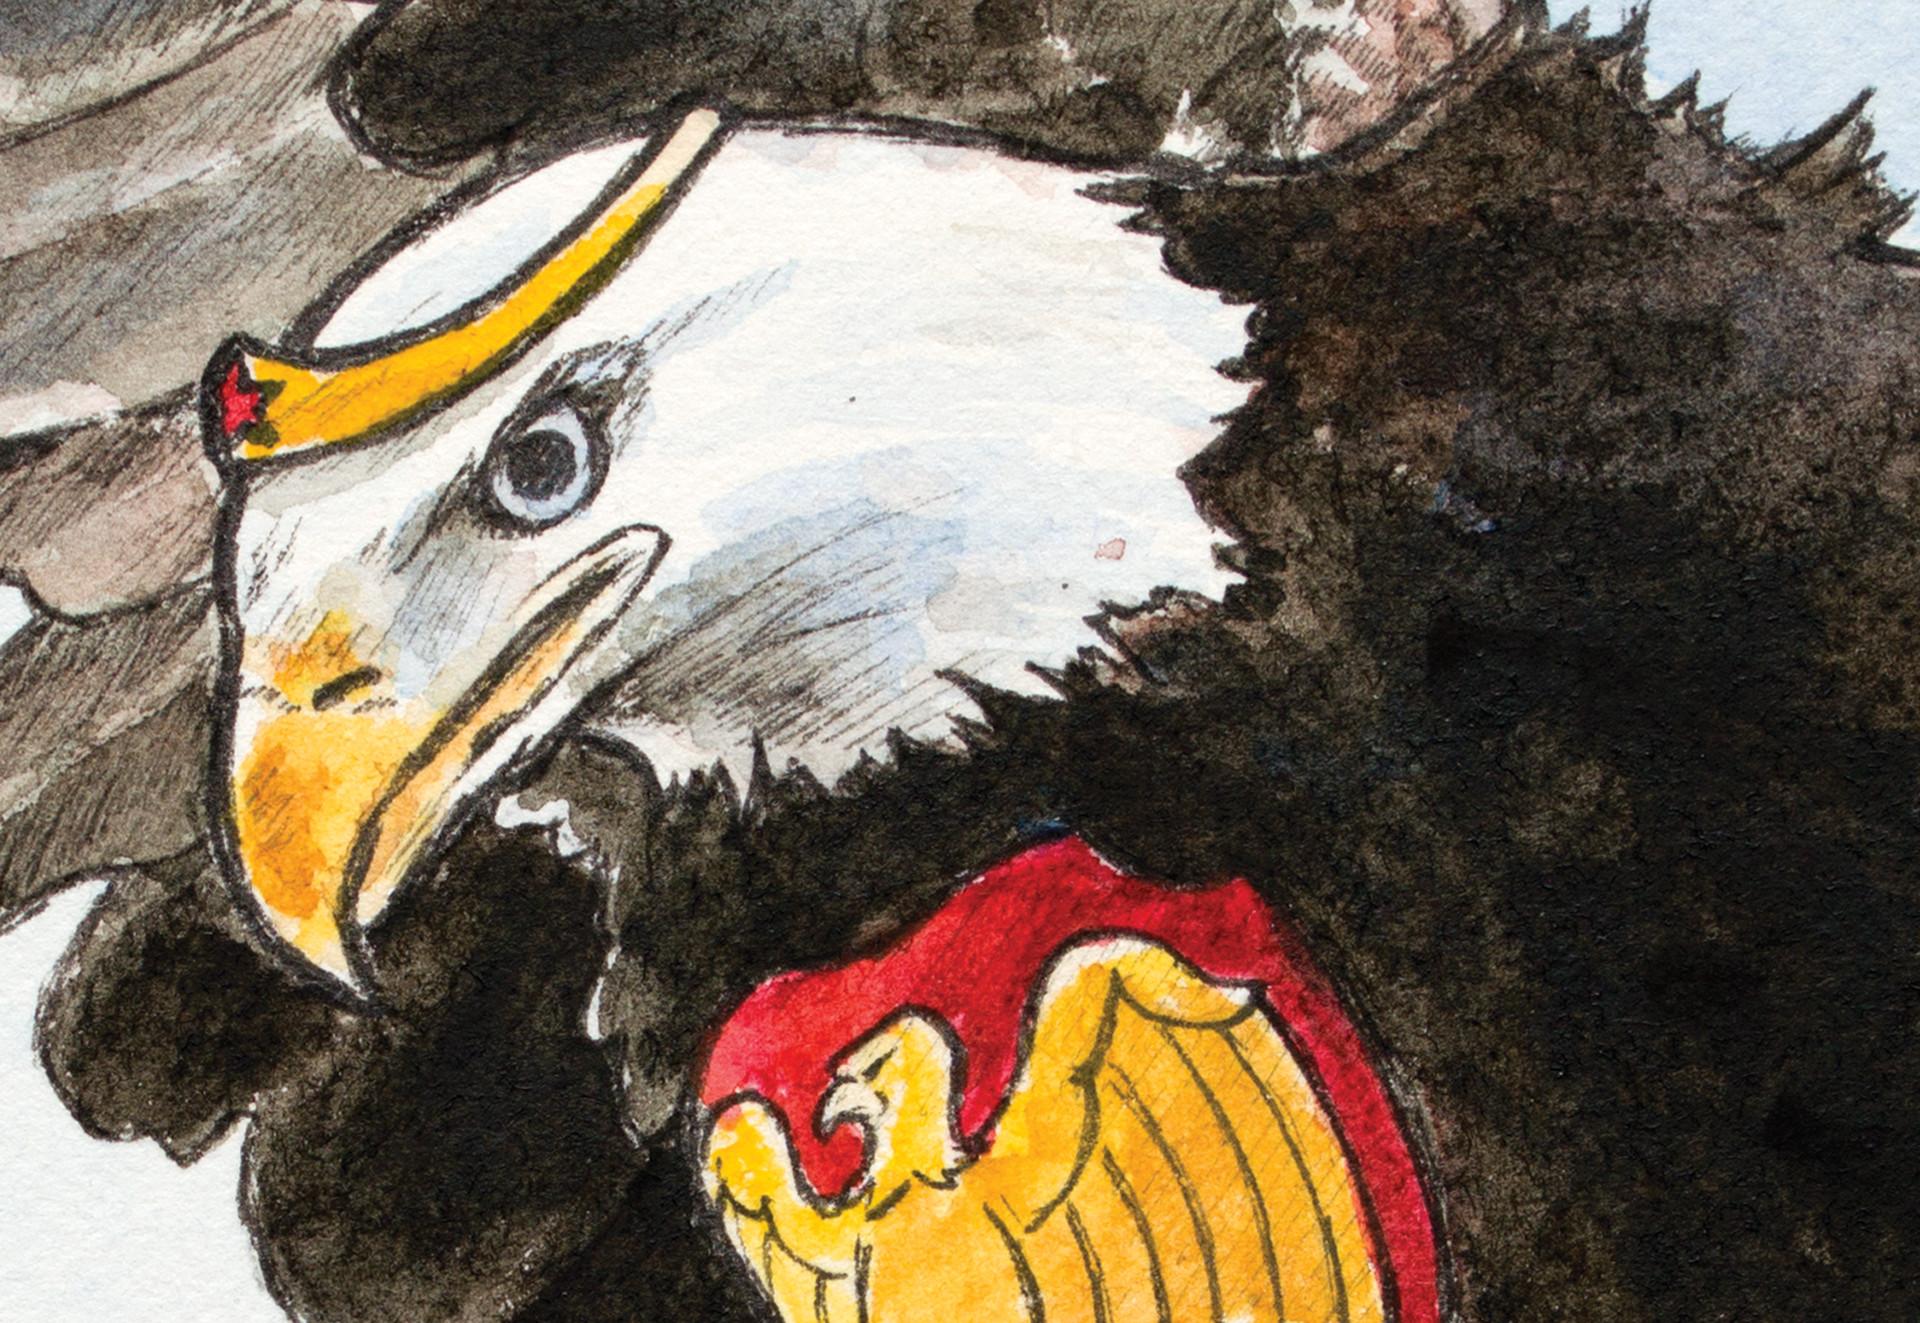 Graham moogk soulis moogk soulis eagle hex